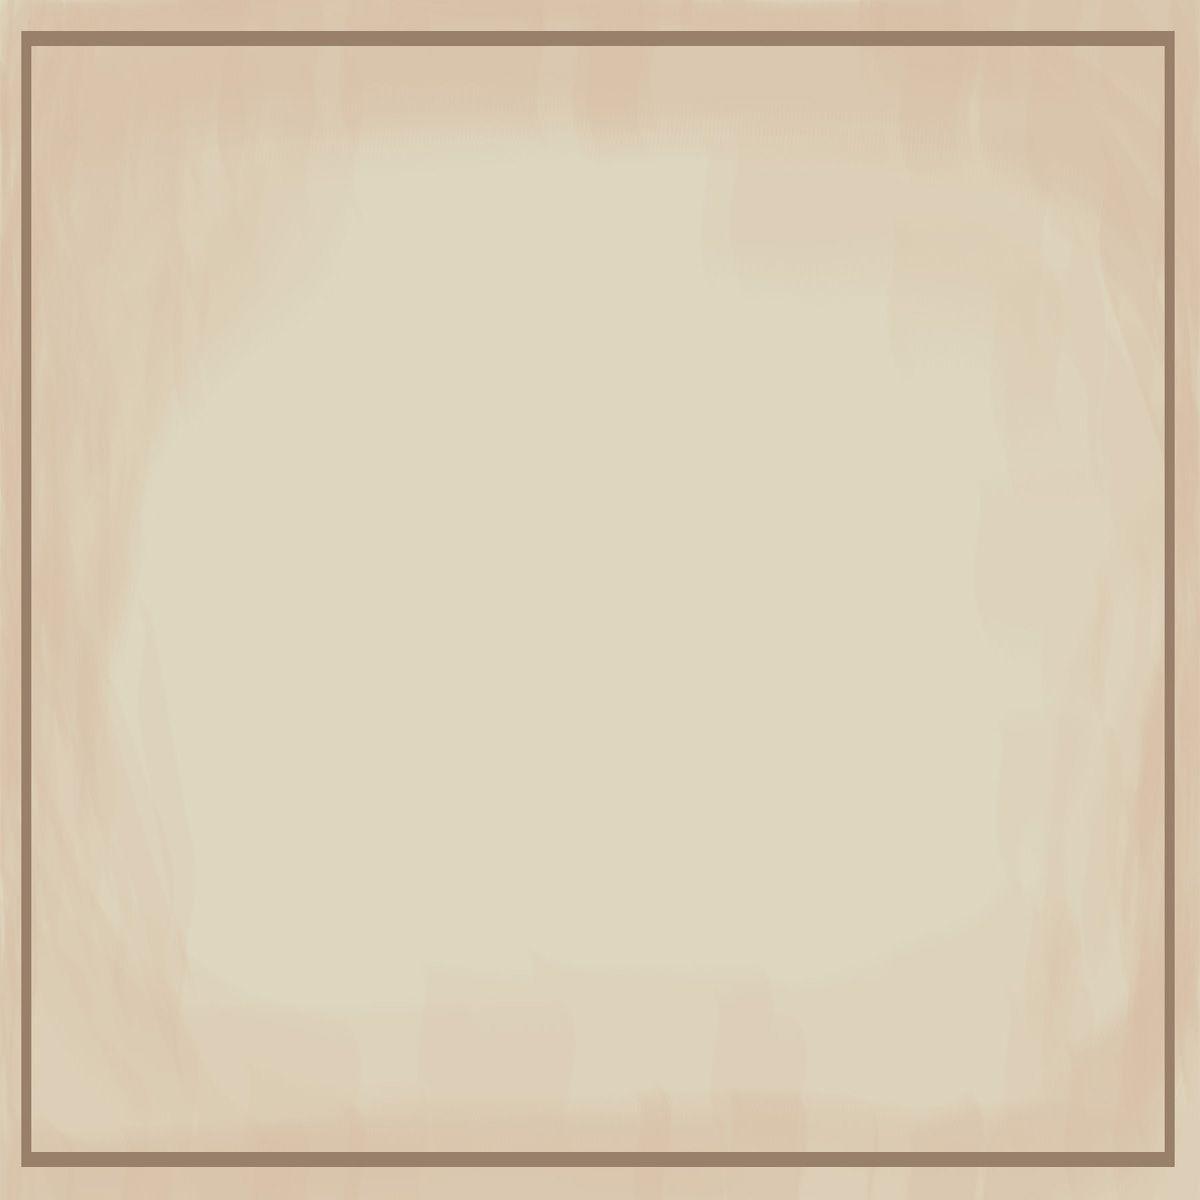 AGED+PAPER+W+BORDER+4X4.jpg (1200×1200)